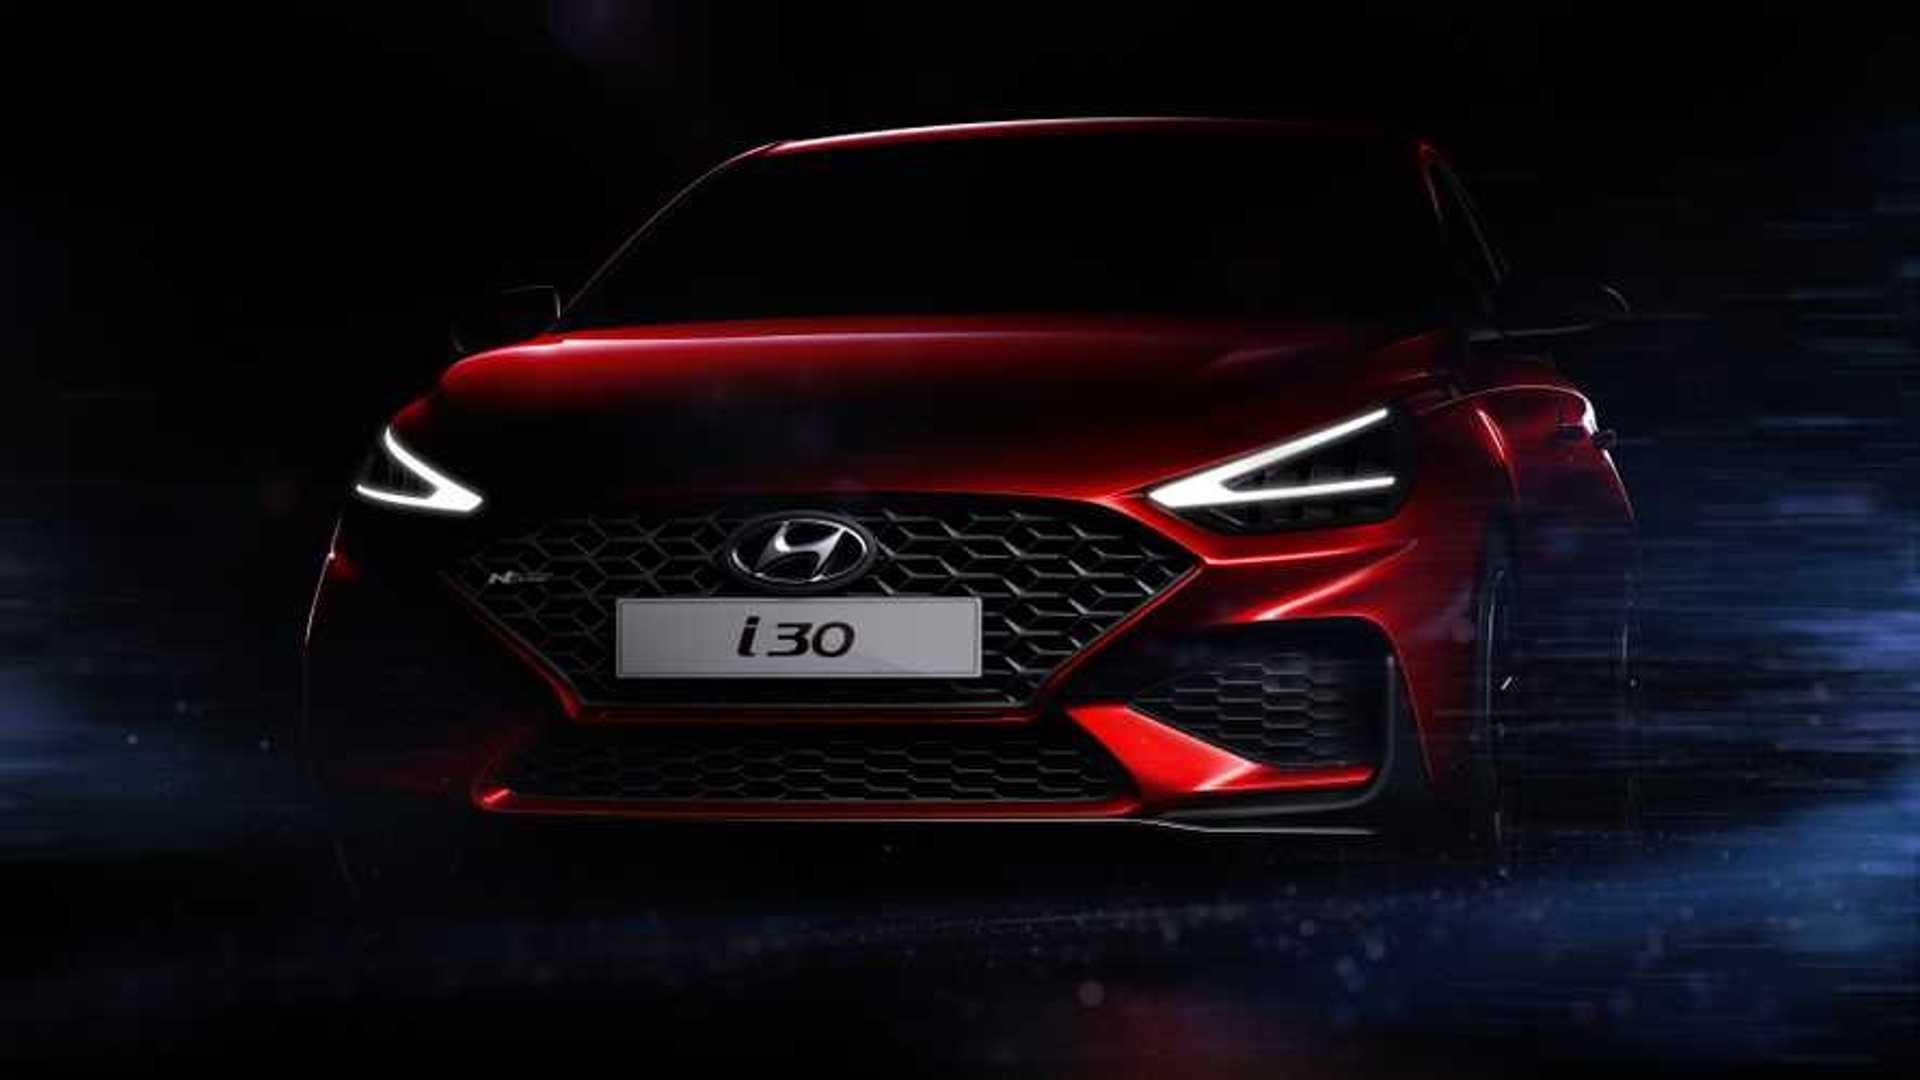 2021 Hyundai I30 N Line Facelift Looks Sharp In Teaser Images